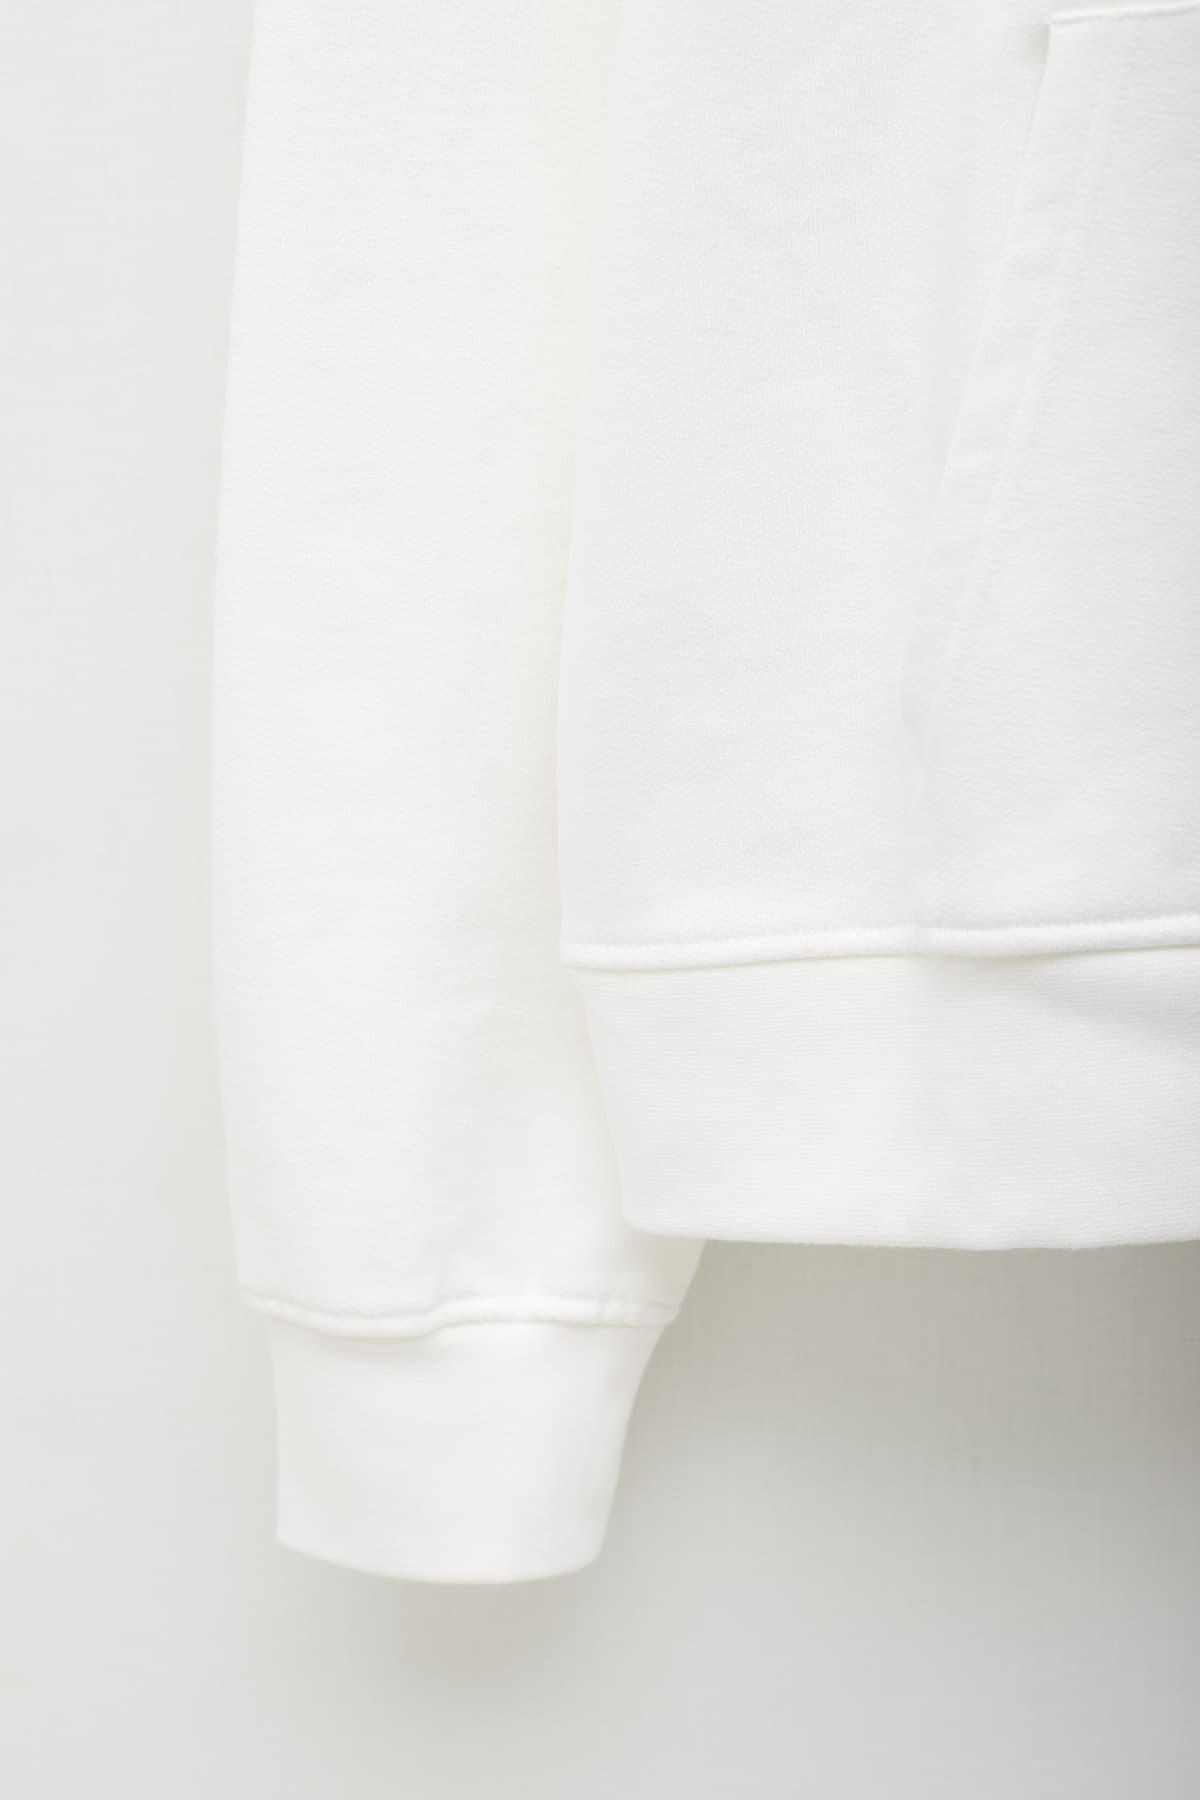 Shop Converse x Slam Jam Pirate Black Utility Sweatshirt